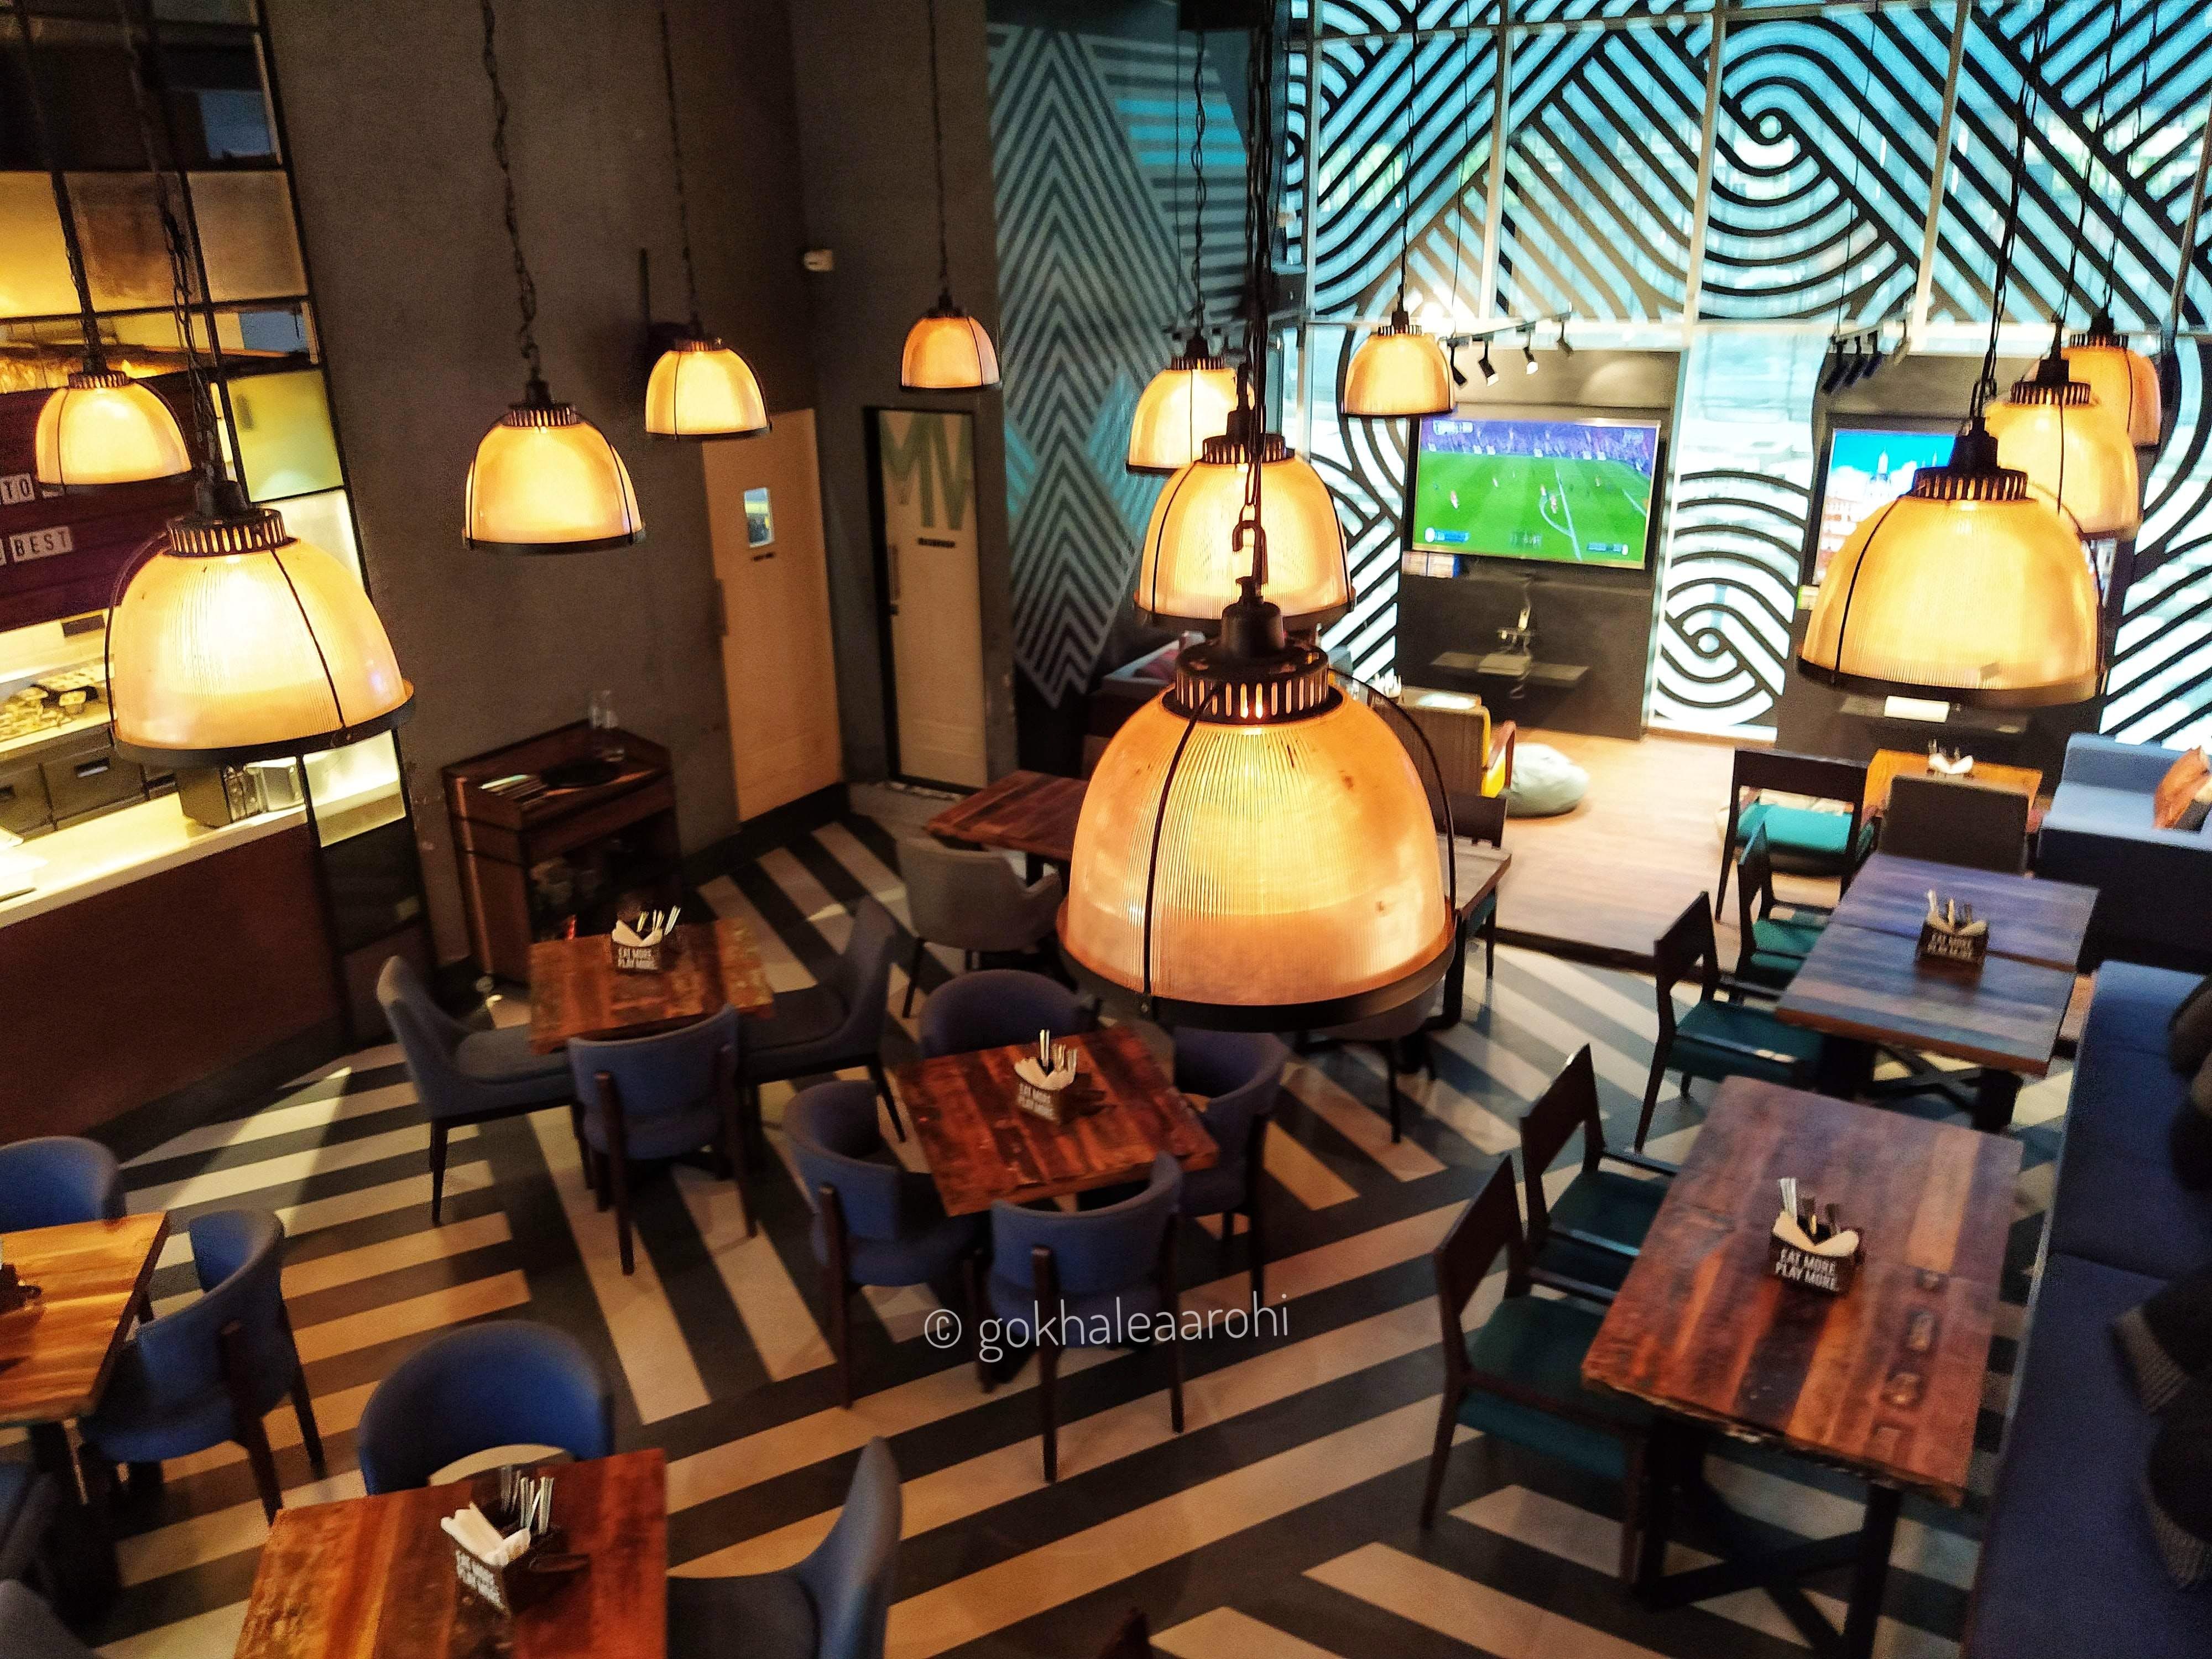 Lighting,Room,Interior design,Lamp